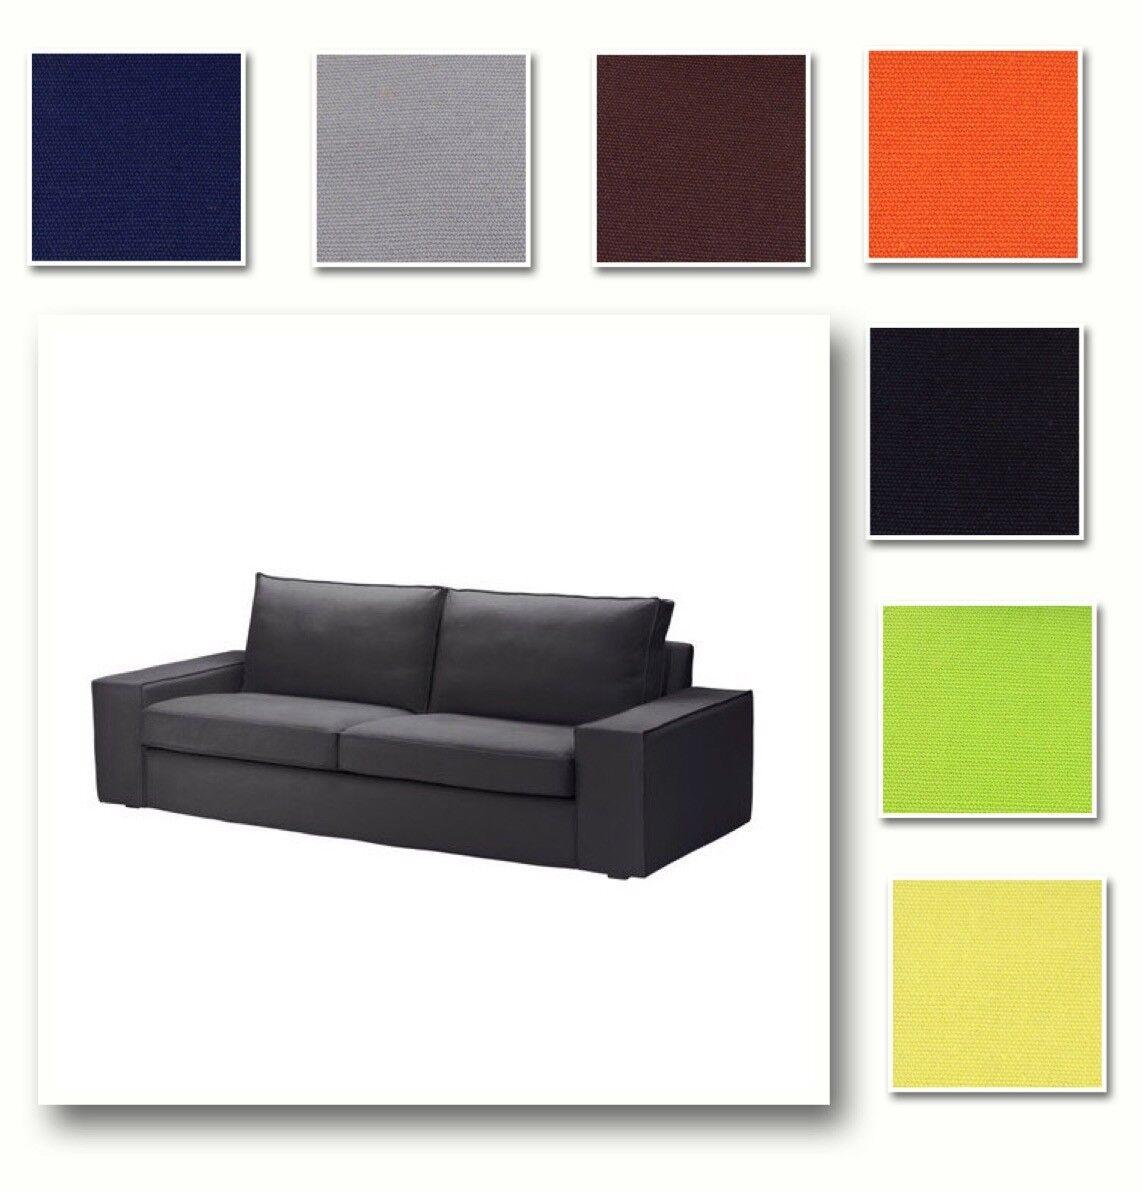 Ikea Kivik Bezug 3er Sofa Isunda Braun 902 751 13